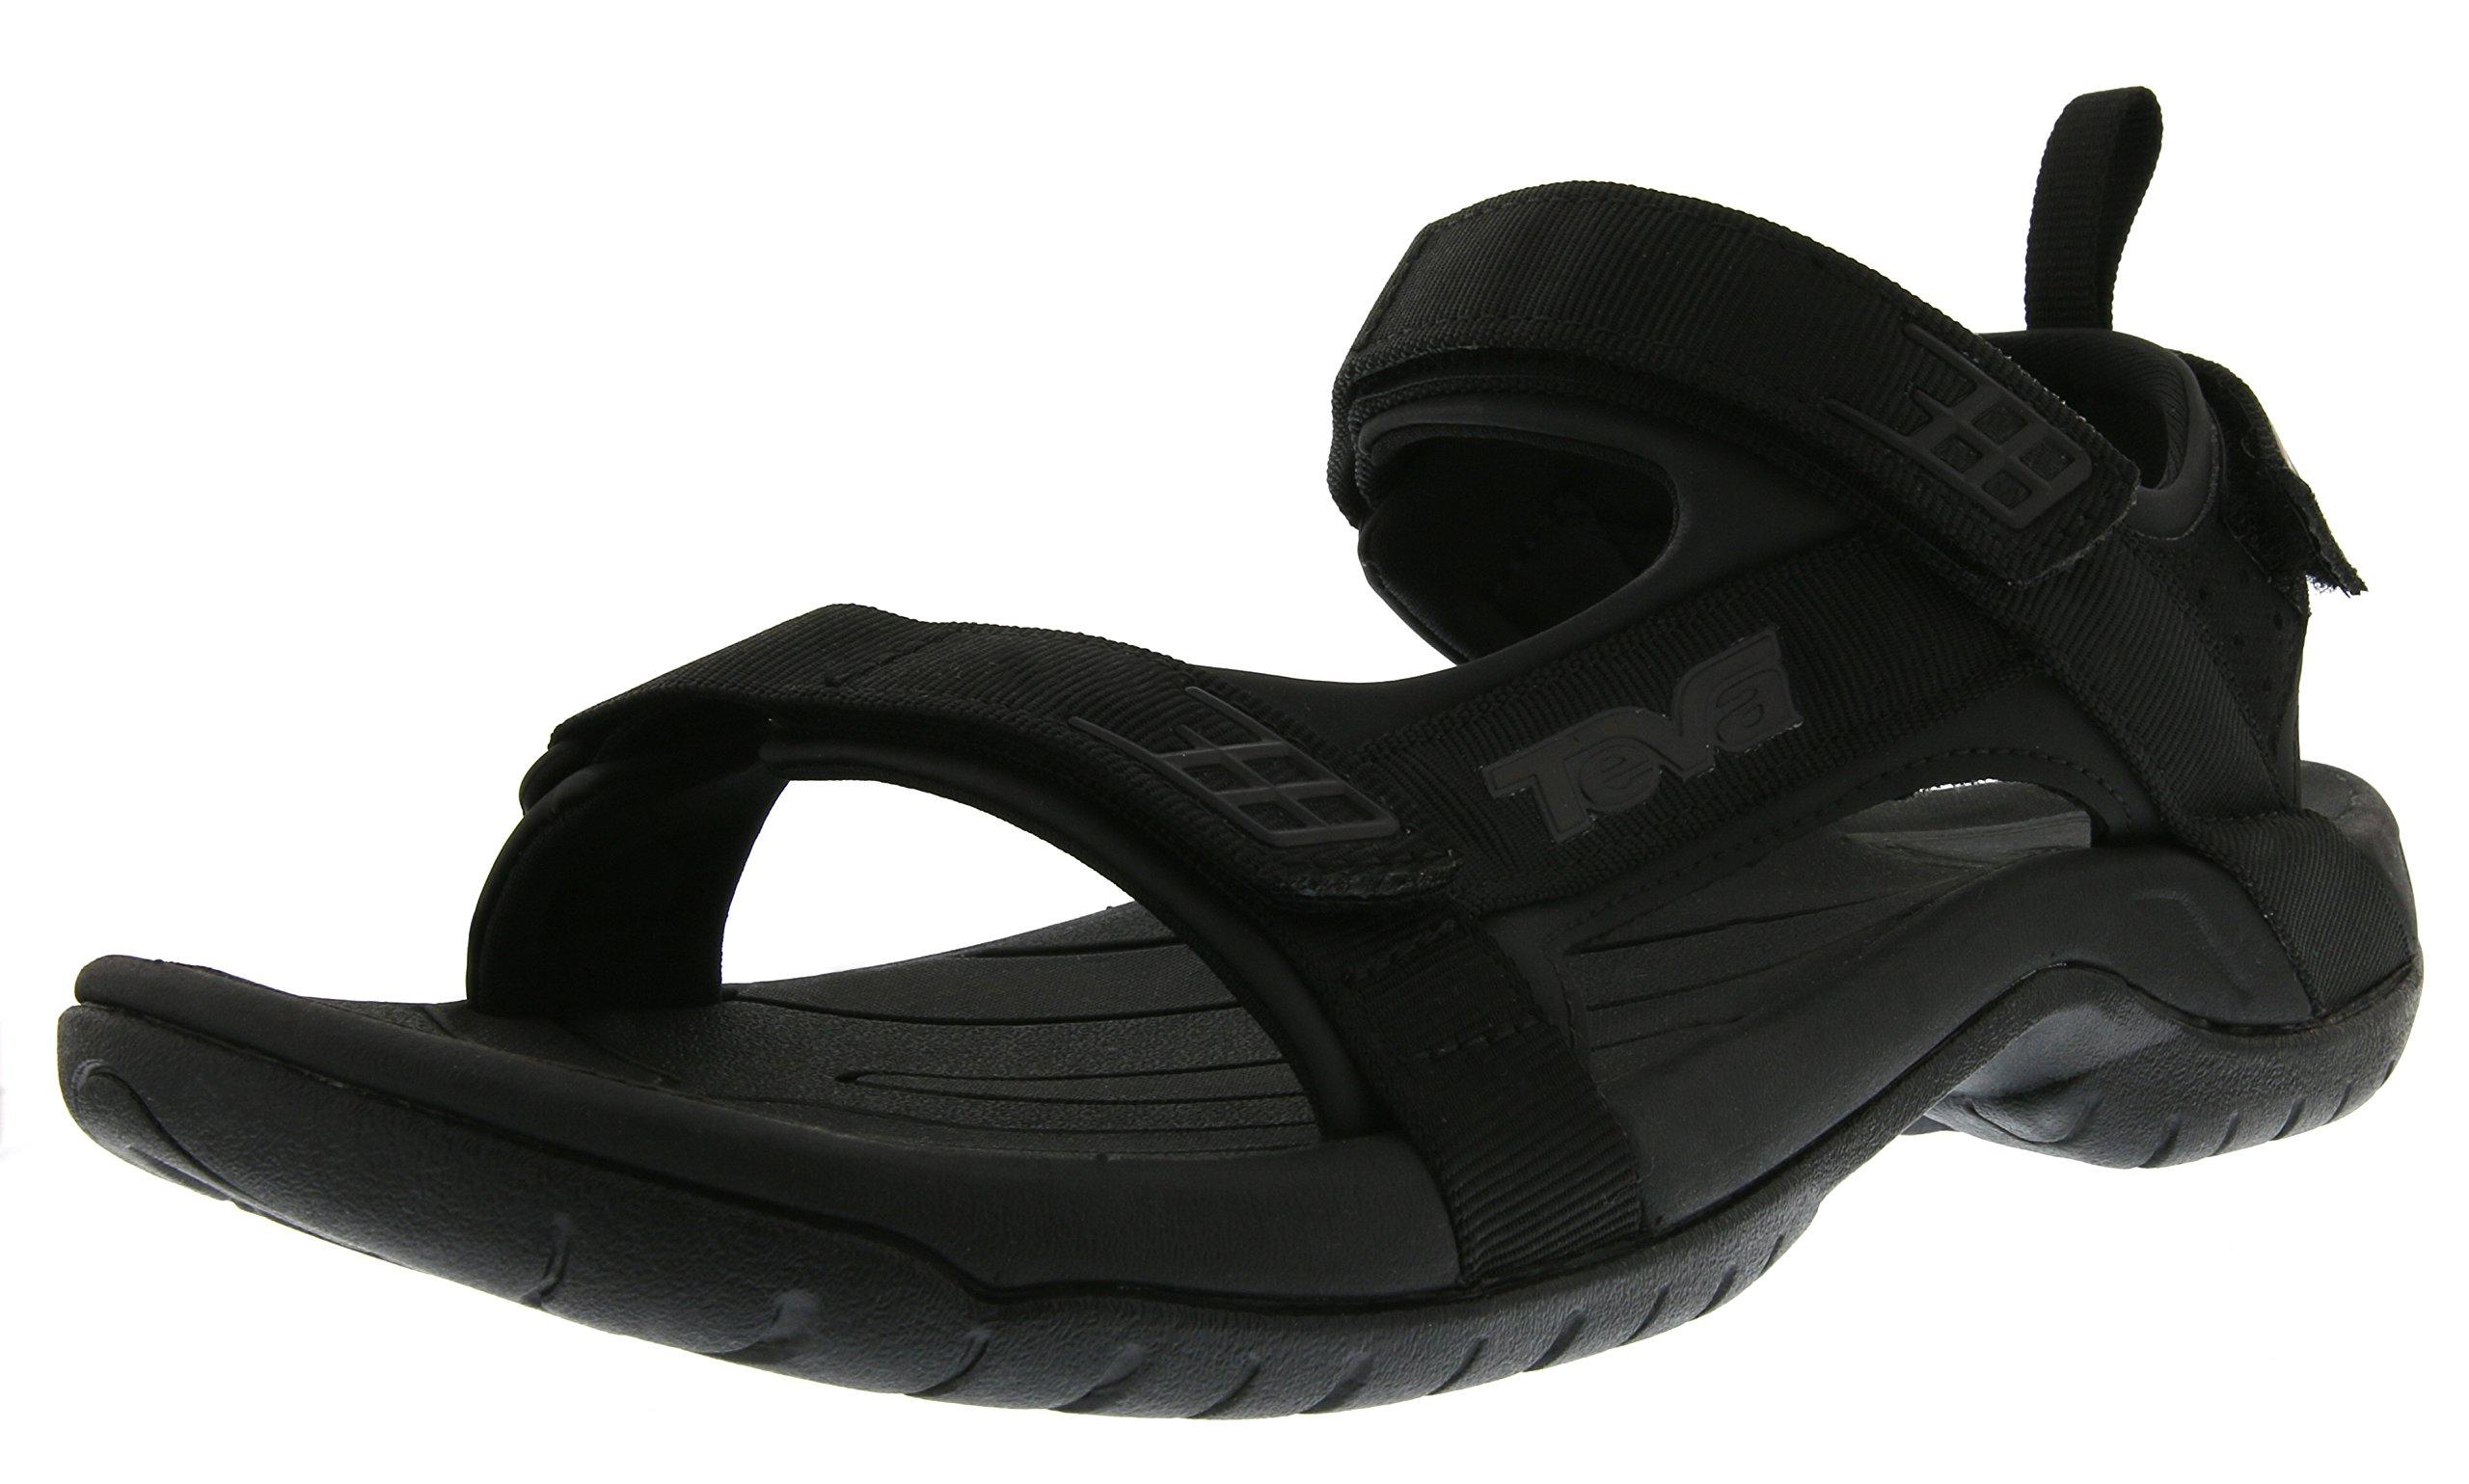 bc65fa618213 Galleon - Teva Mens Tanza Open Toe Sport Sandal Shoes